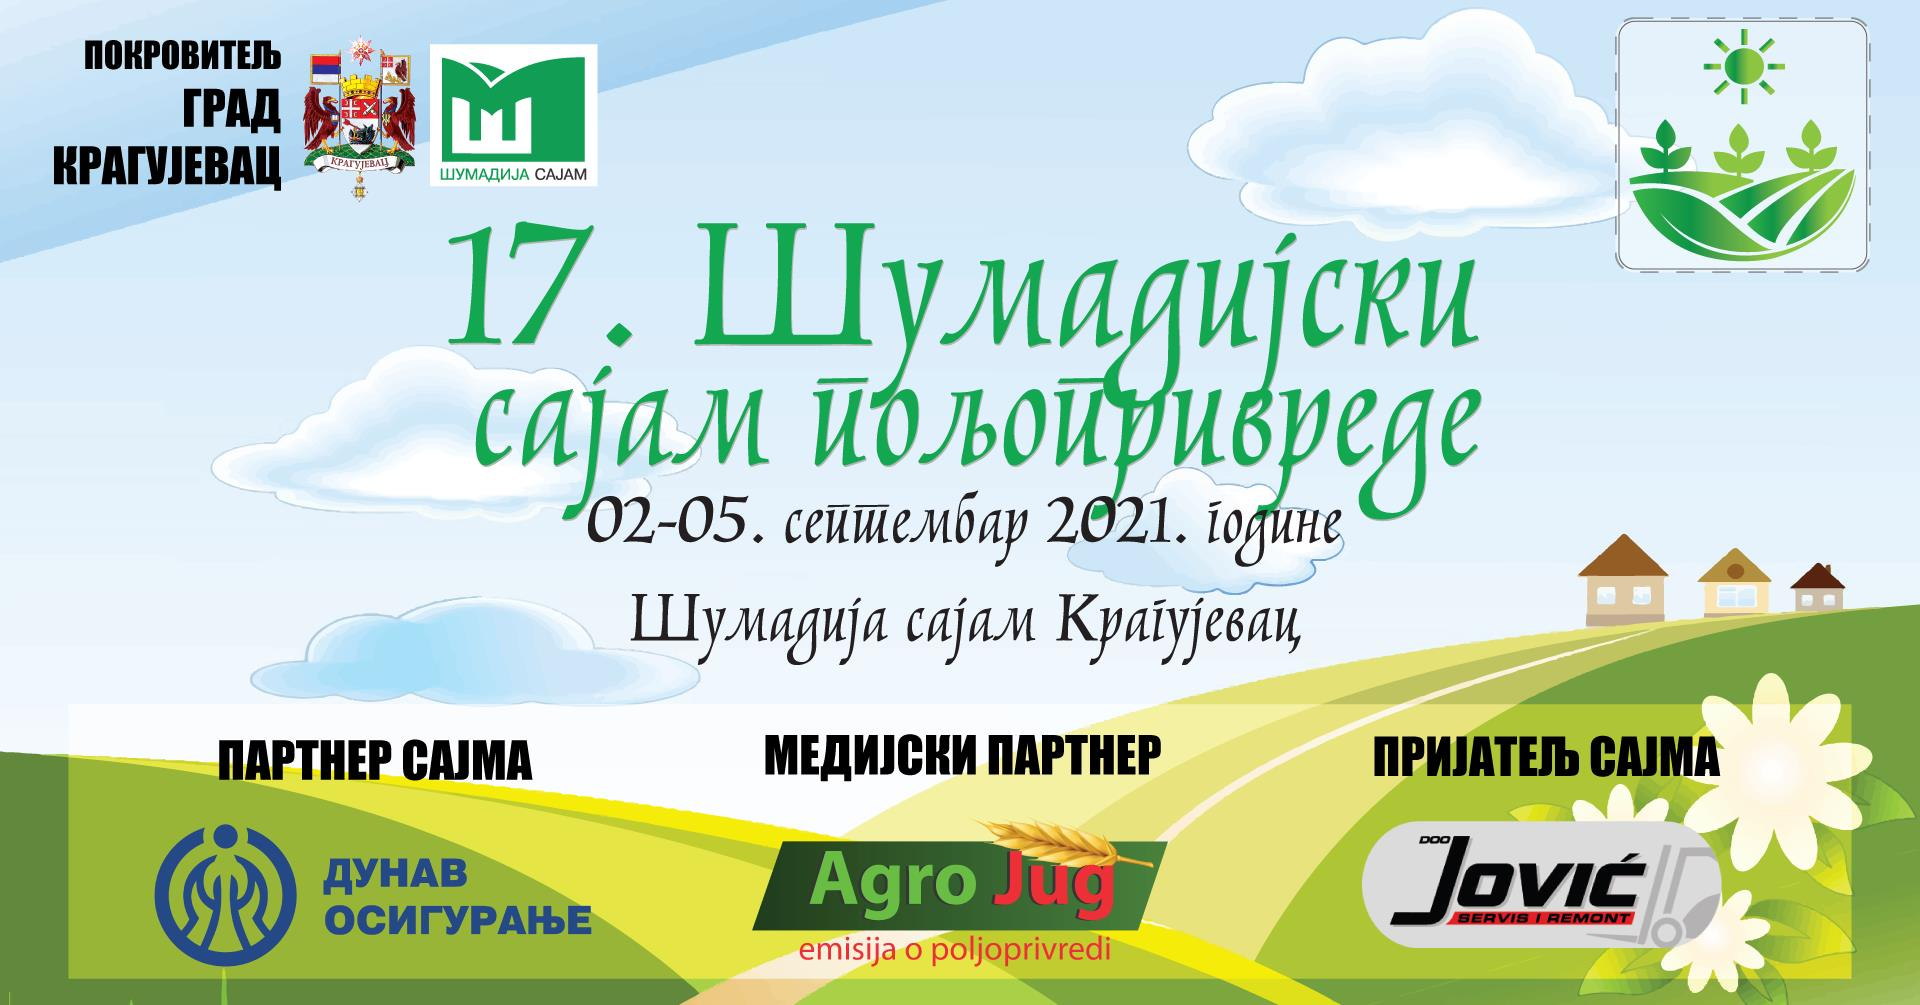 plakat-17-sumadijski-sajam-poljoprivrede-2021-kragujevac